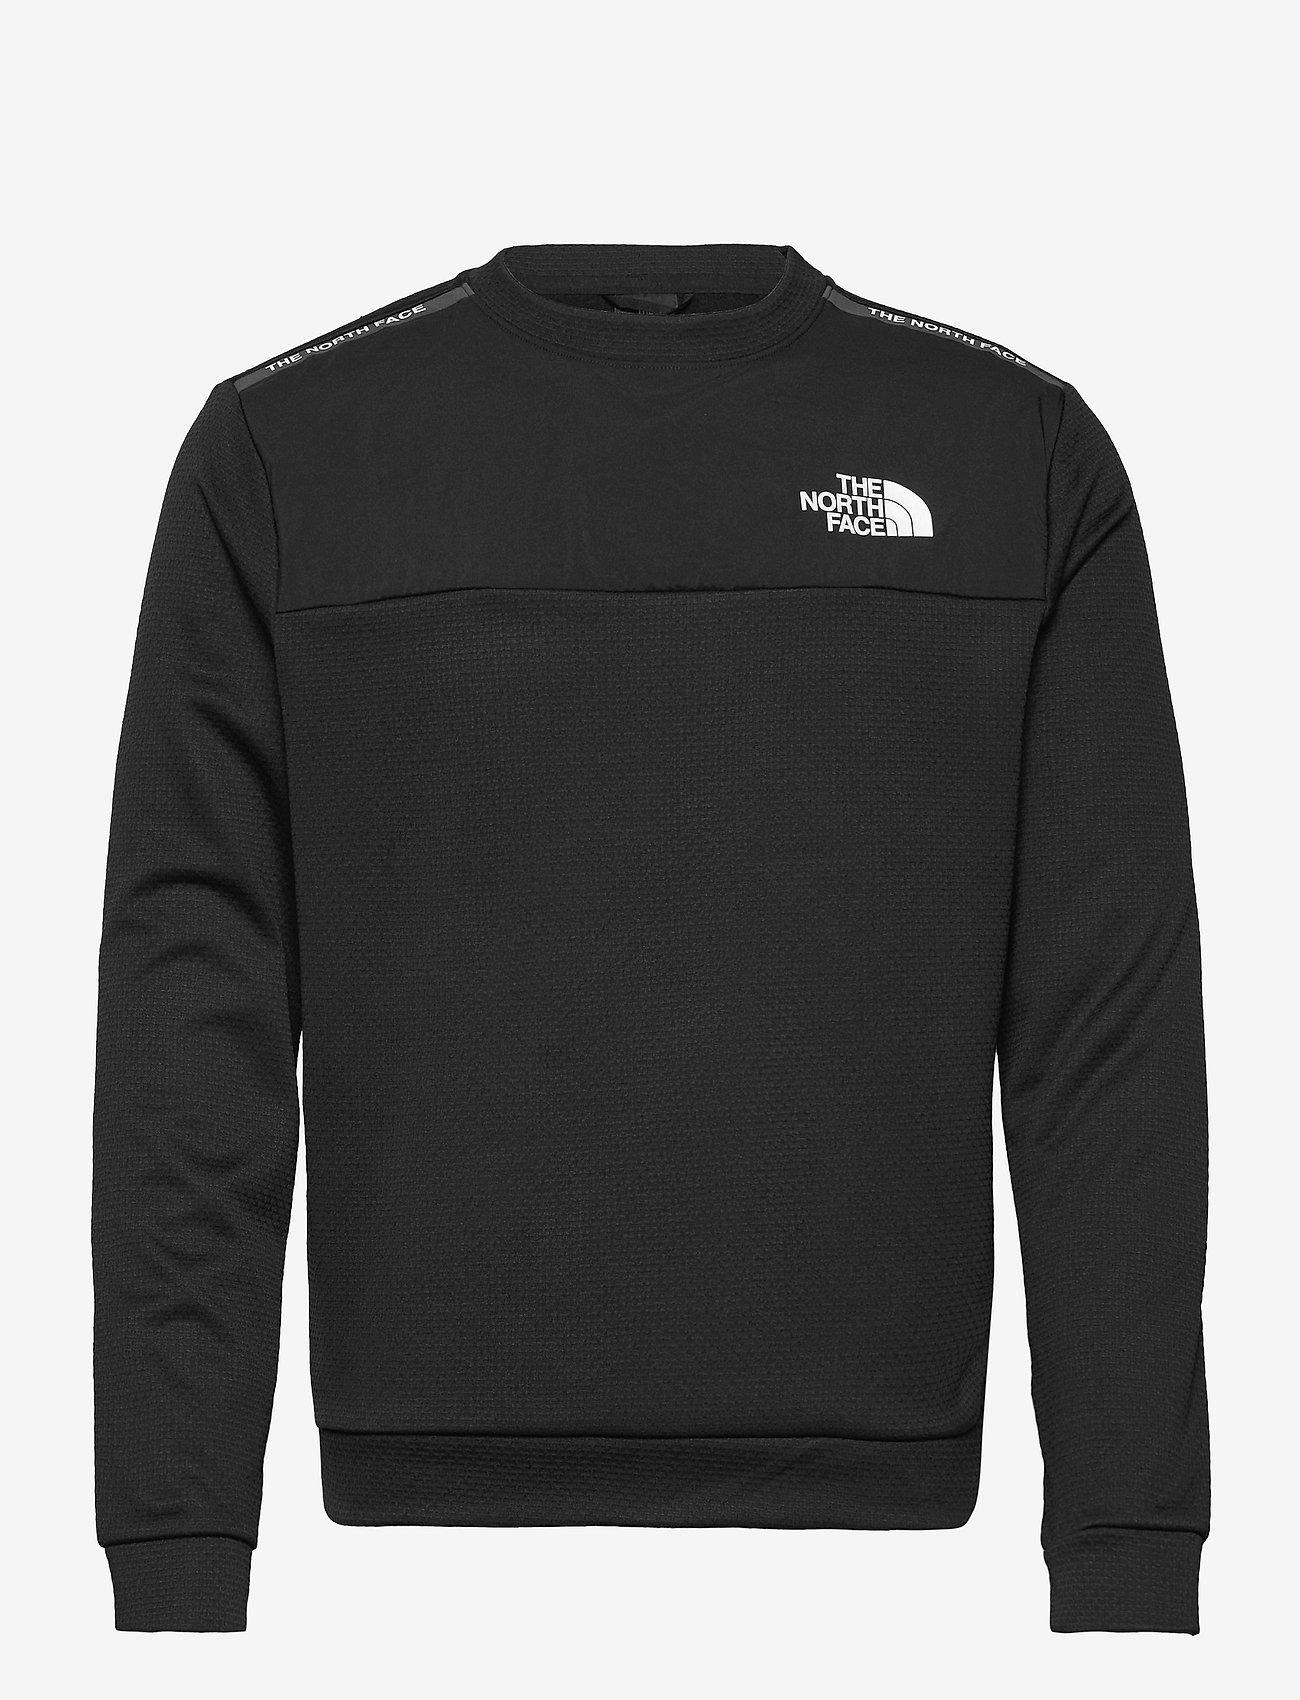 The North Face - M MA CREW - sweats basiques - tnf black - 0